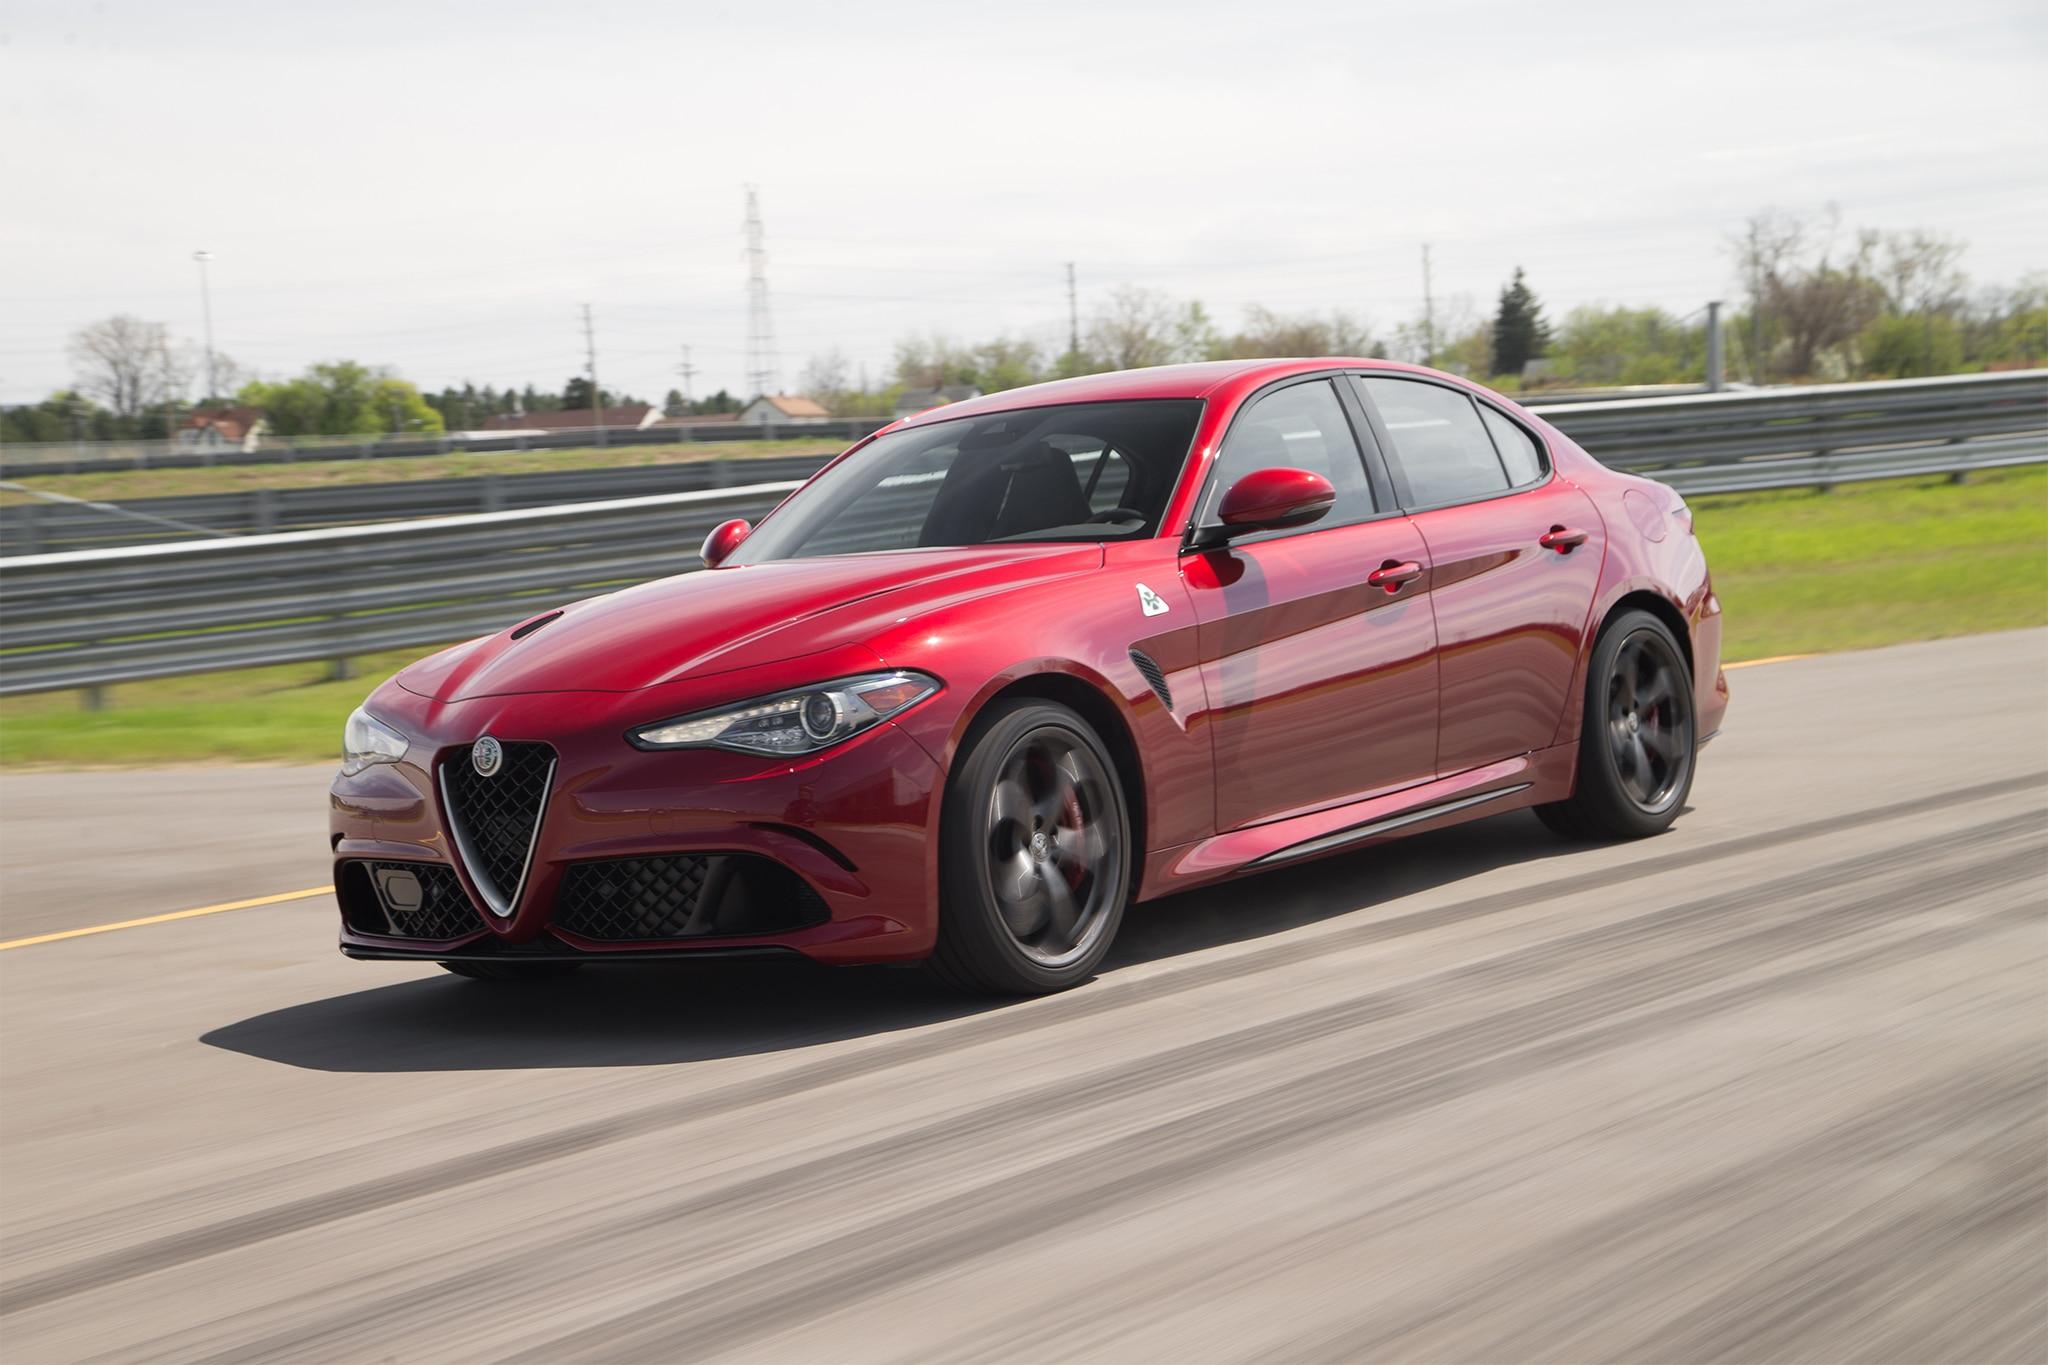 2017 Alfa Romeo Giulia Quadrifoglio Front Three Quarter In Motion 06